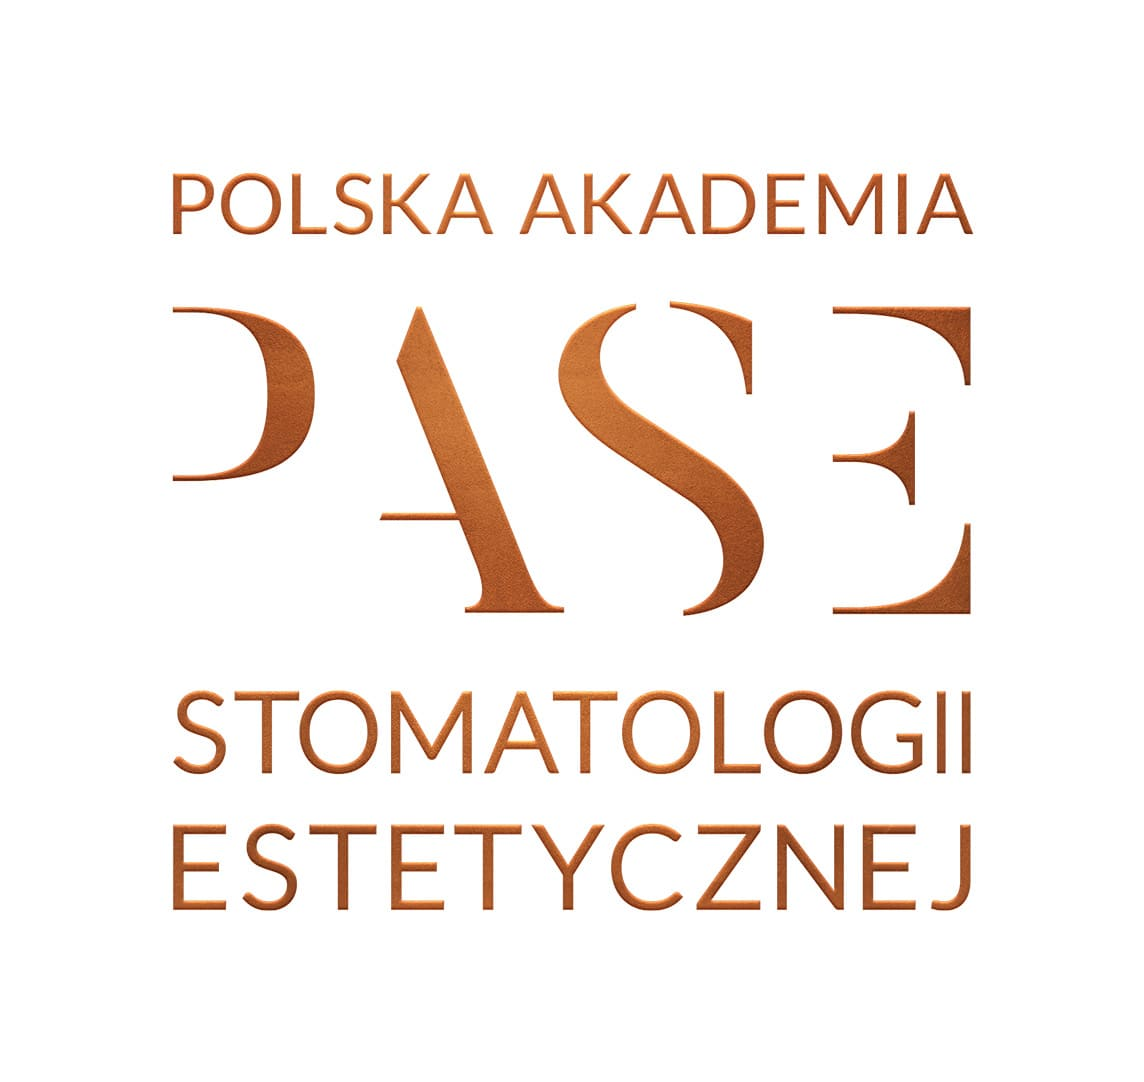 Polska Akademia stomatologii estetycznej logo